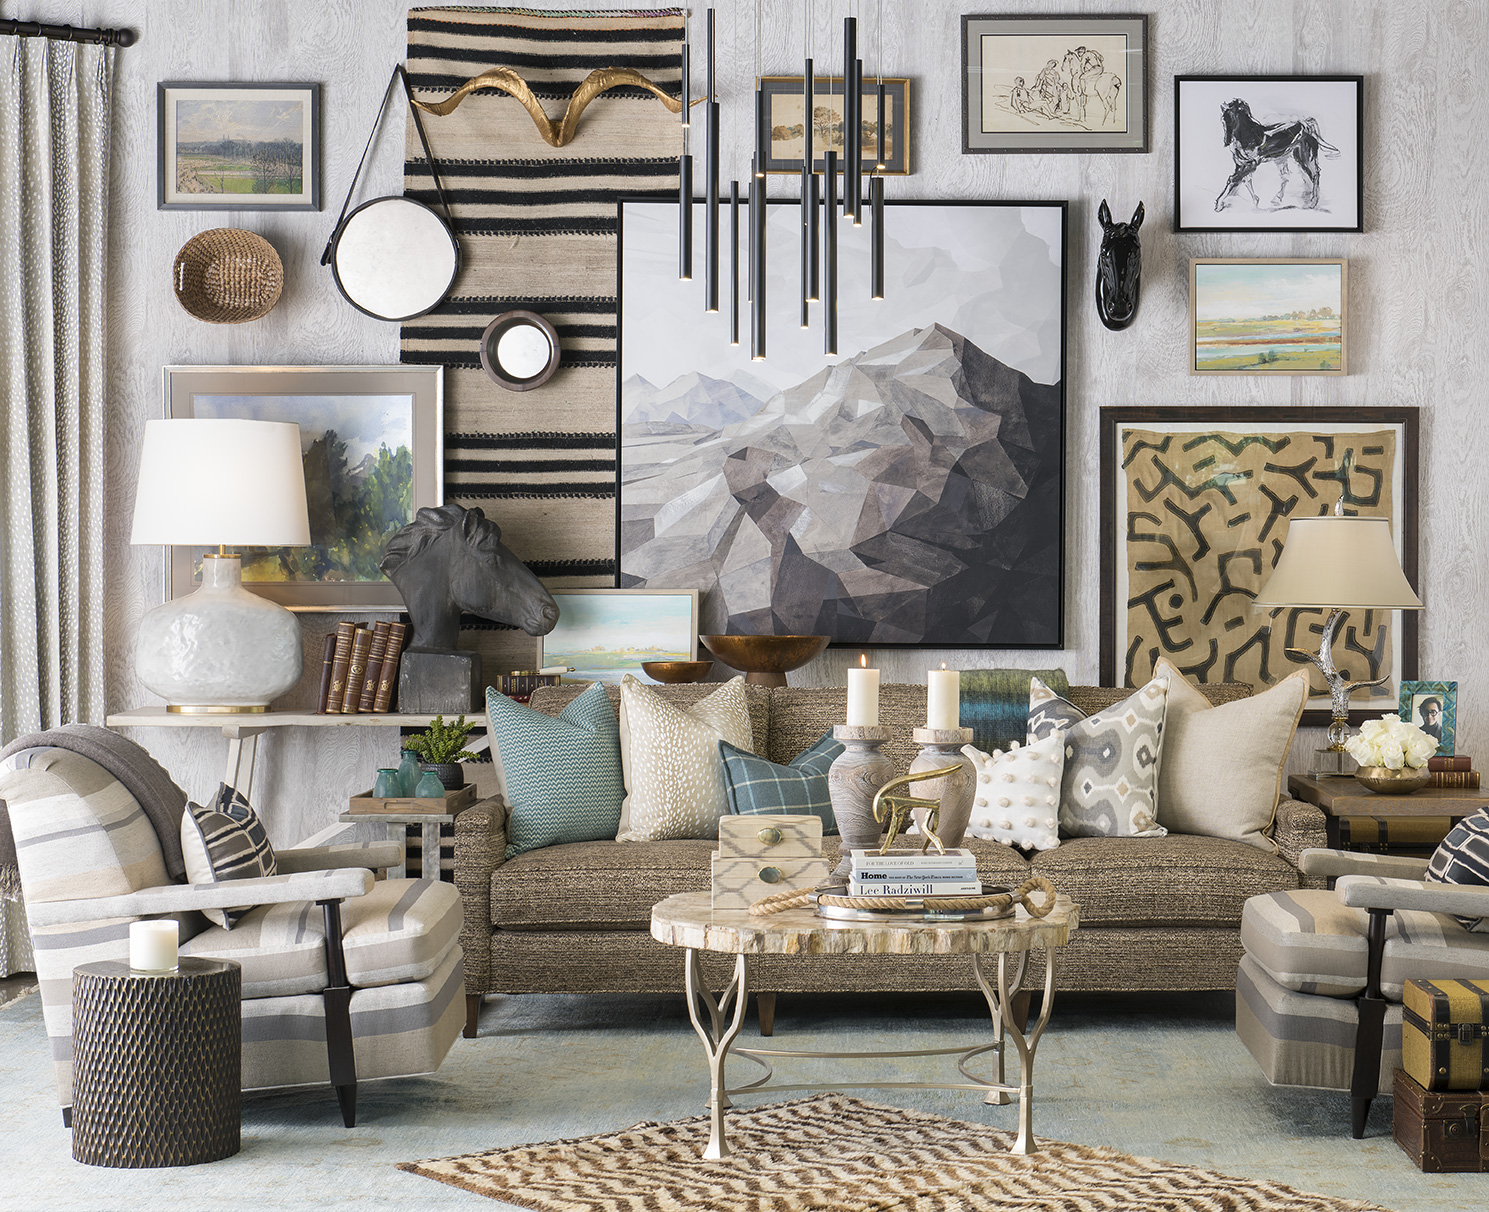 Living Room Design By Michael Reese, IBB Designer